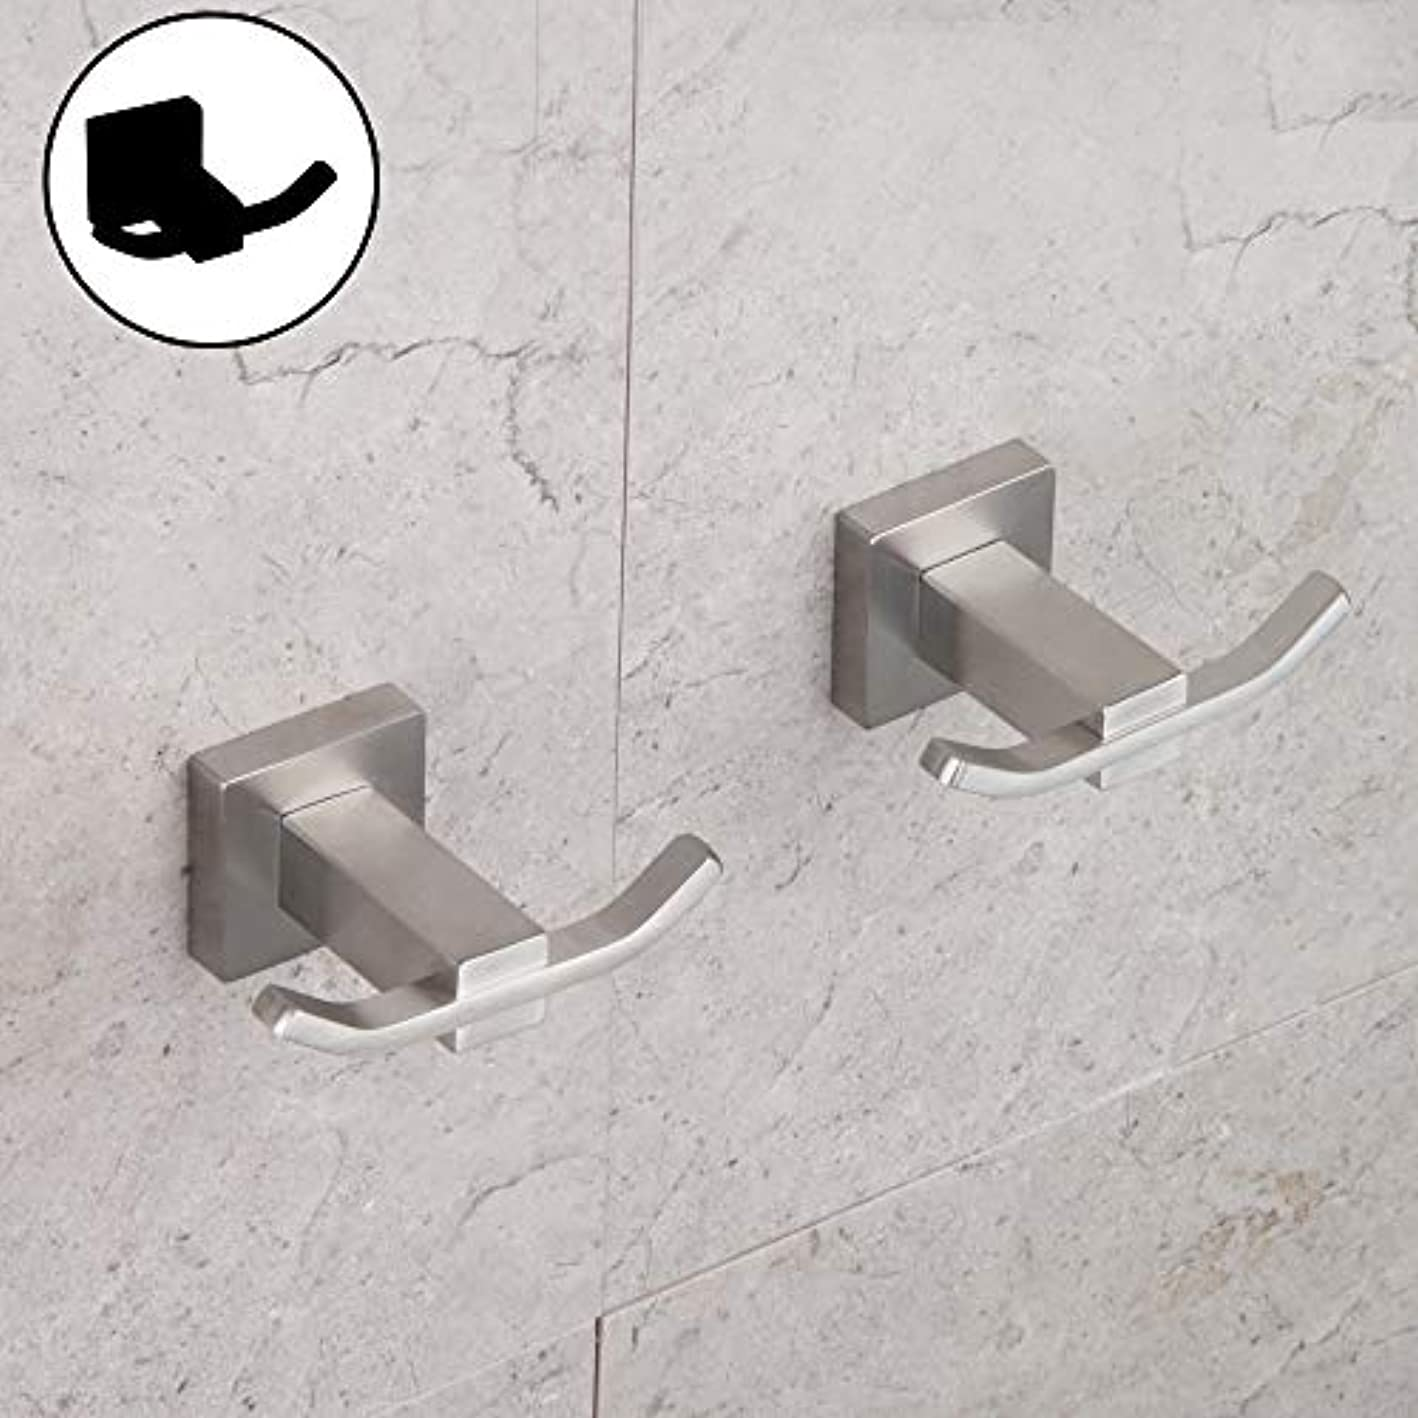 SUS 304 Stainless Steel Bathroom Double Robe Hook Lavatory Bath Towel Hook Coat Hook Wall Mounted 2 Pack Brushed Finish